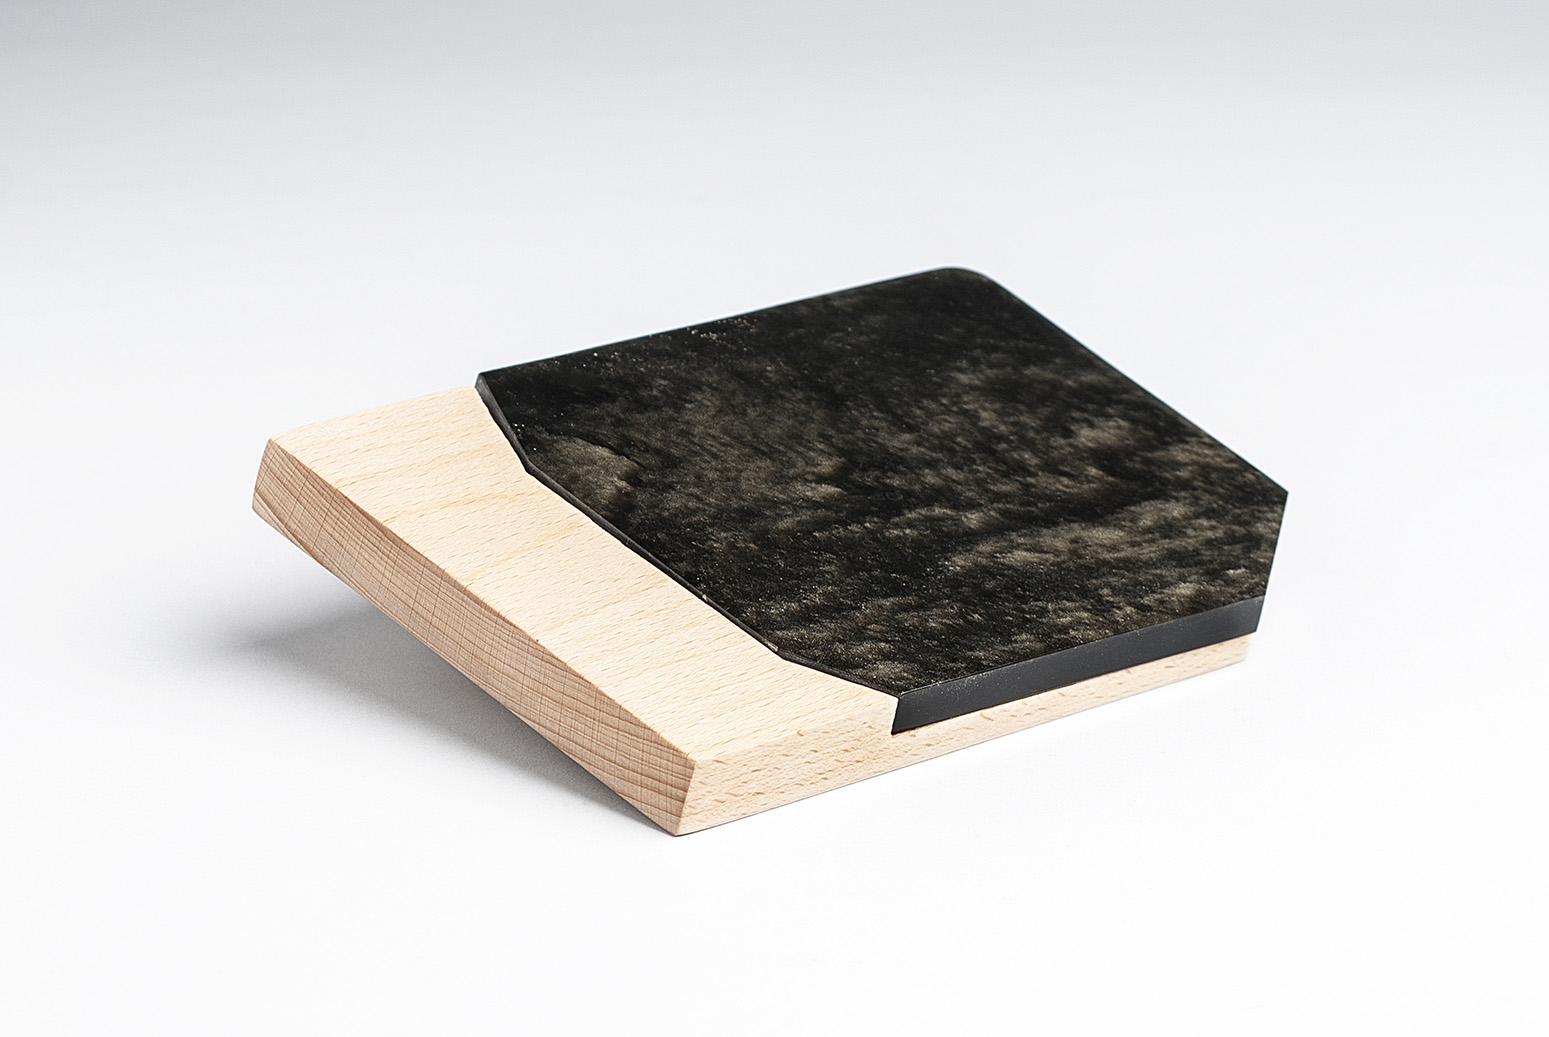 Obsidian-chopping-board-tray-designer-Ricardo Martorell-artisan-Griselda Gómez García-Anahuac-MarionFriedmann-MexicoDesignTime6.jpg